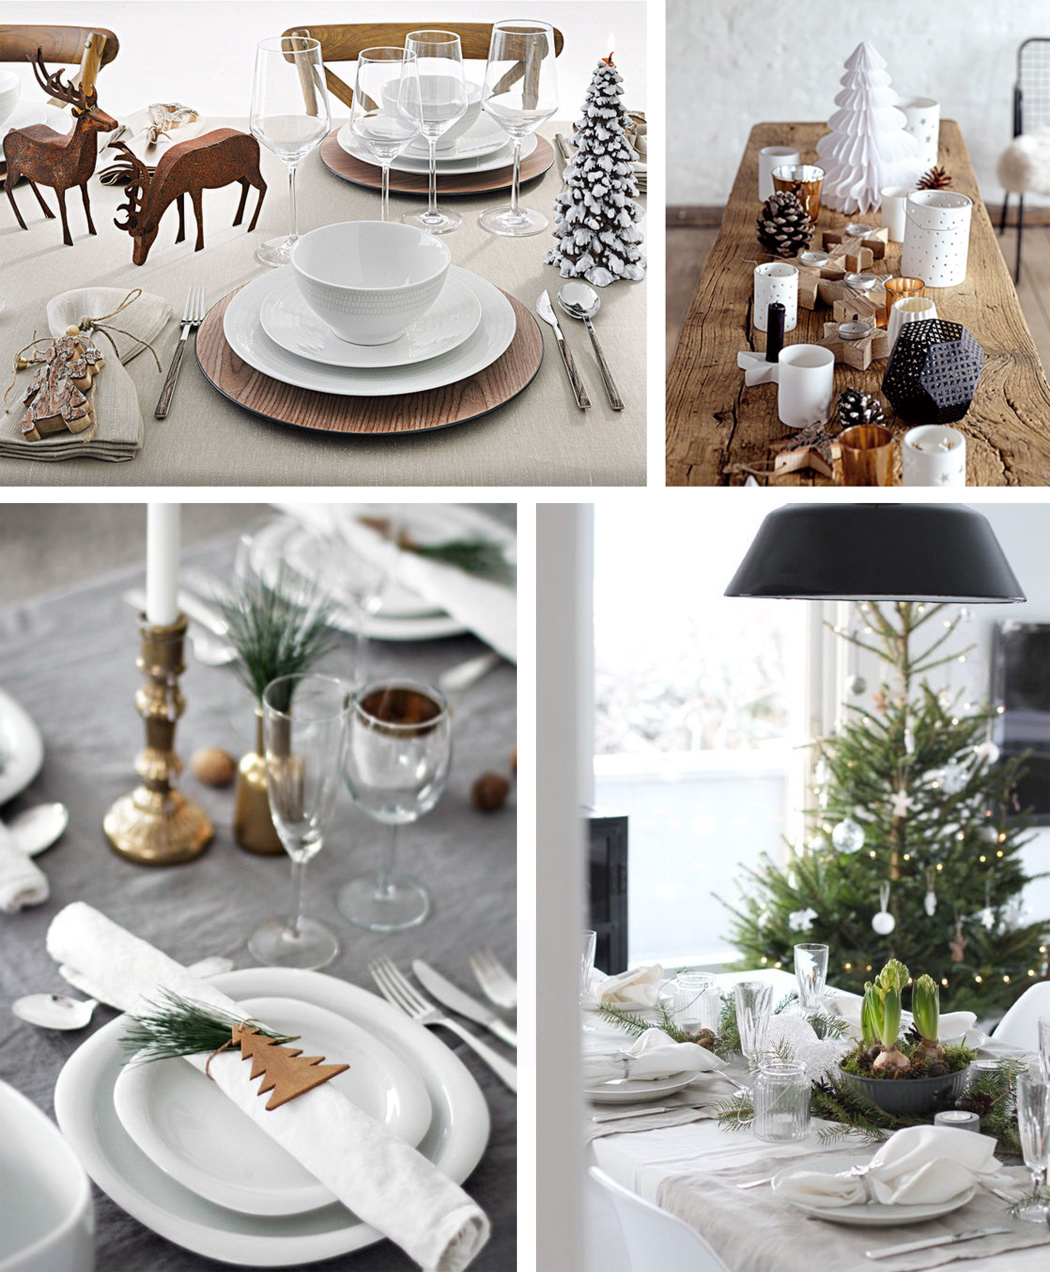 Preparare La Tavola Delle Feste : Christmas tableware la tavola delle feste